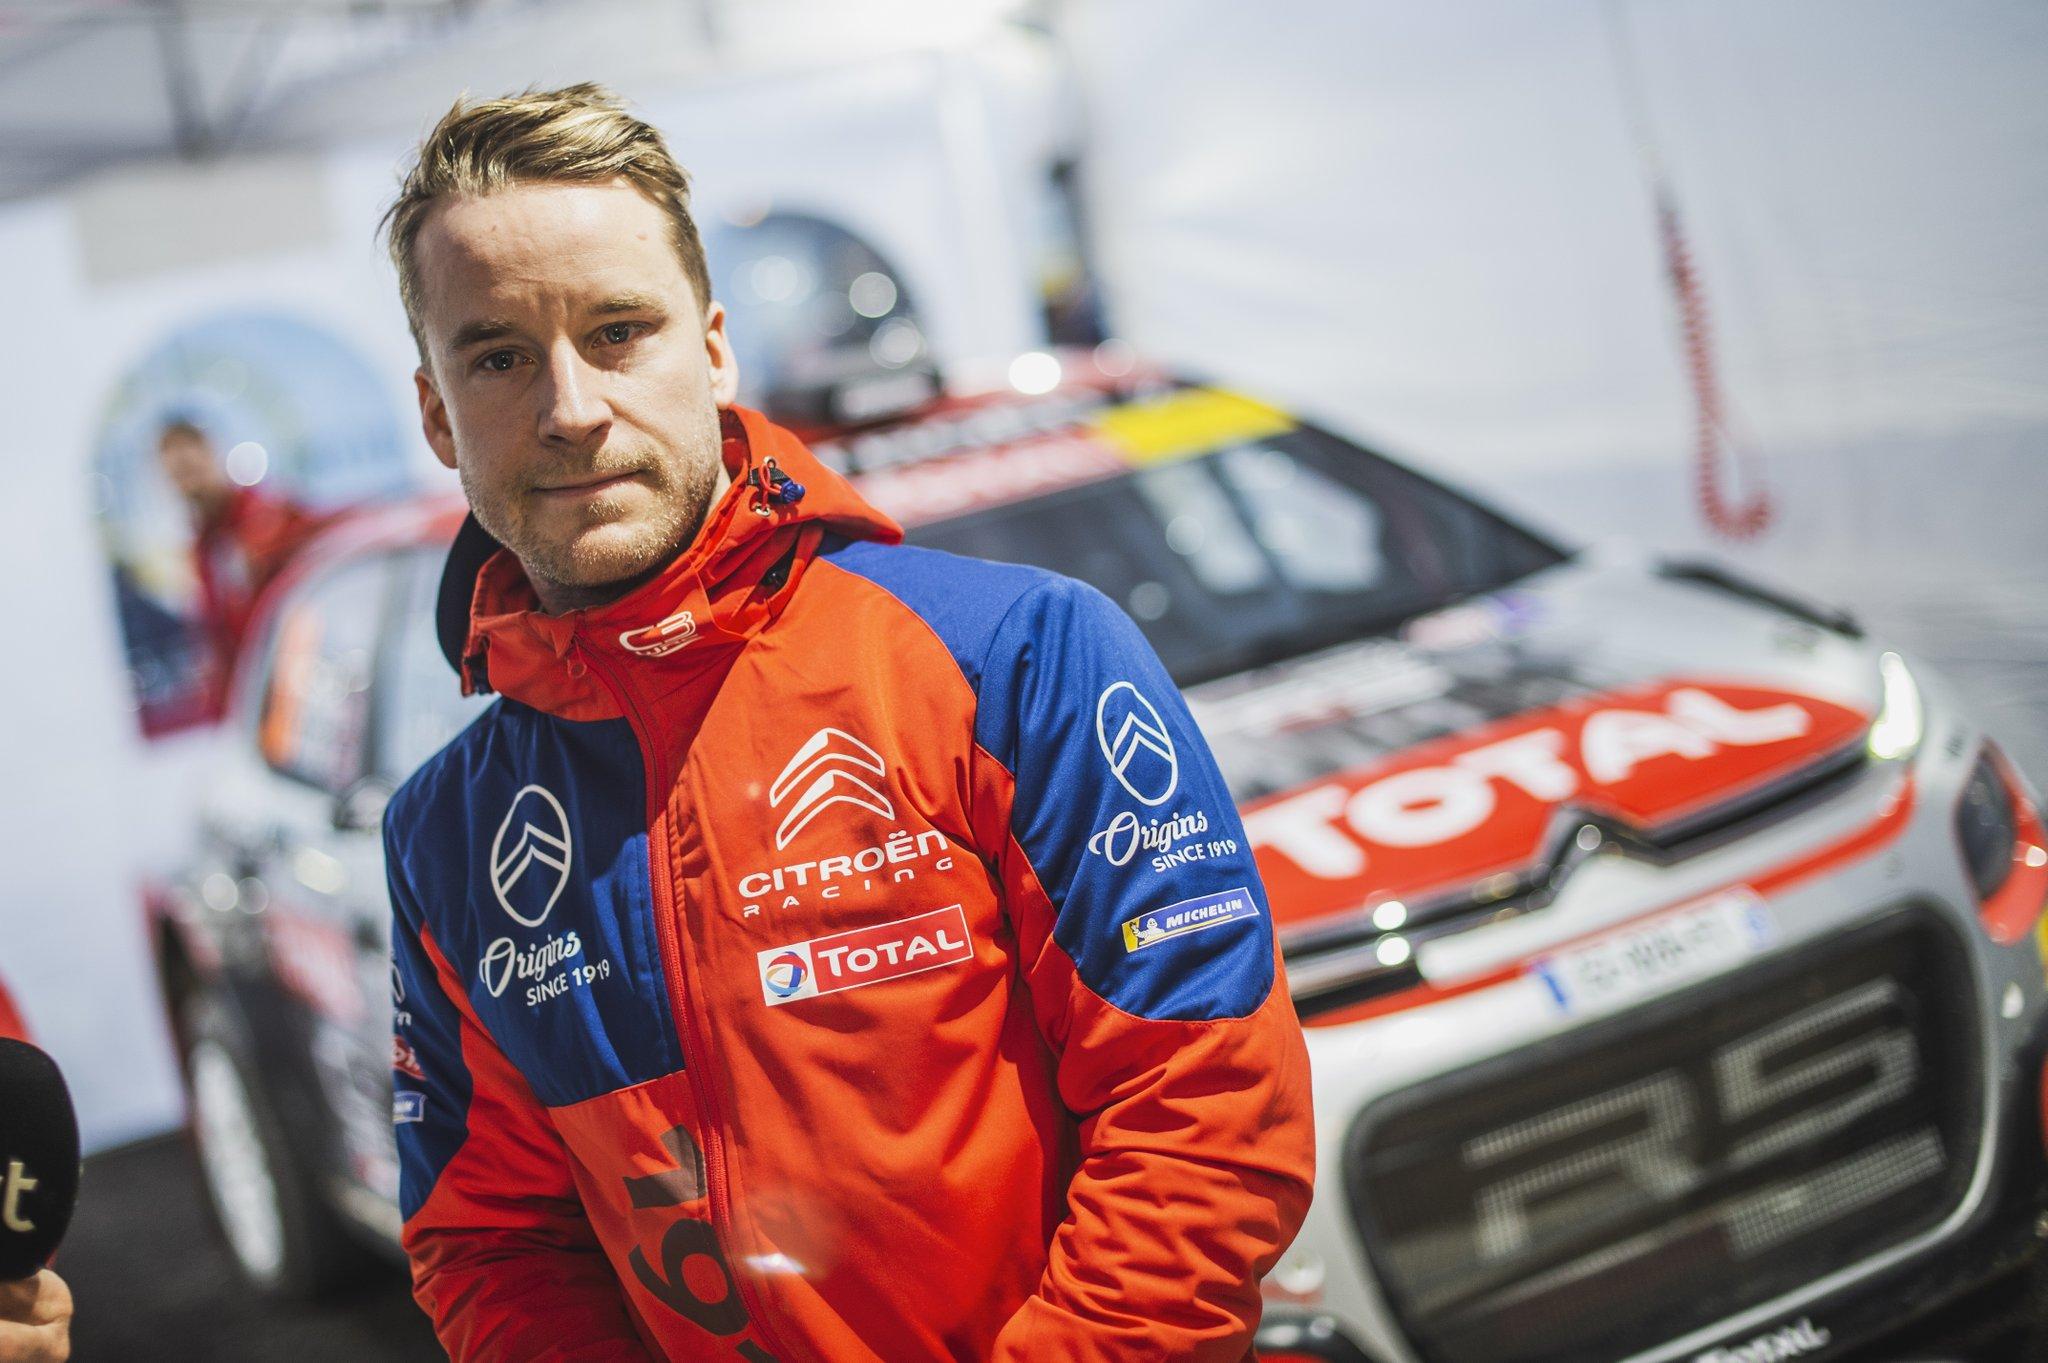 Mads Ostberg a rally VB-n is rajthoz áll